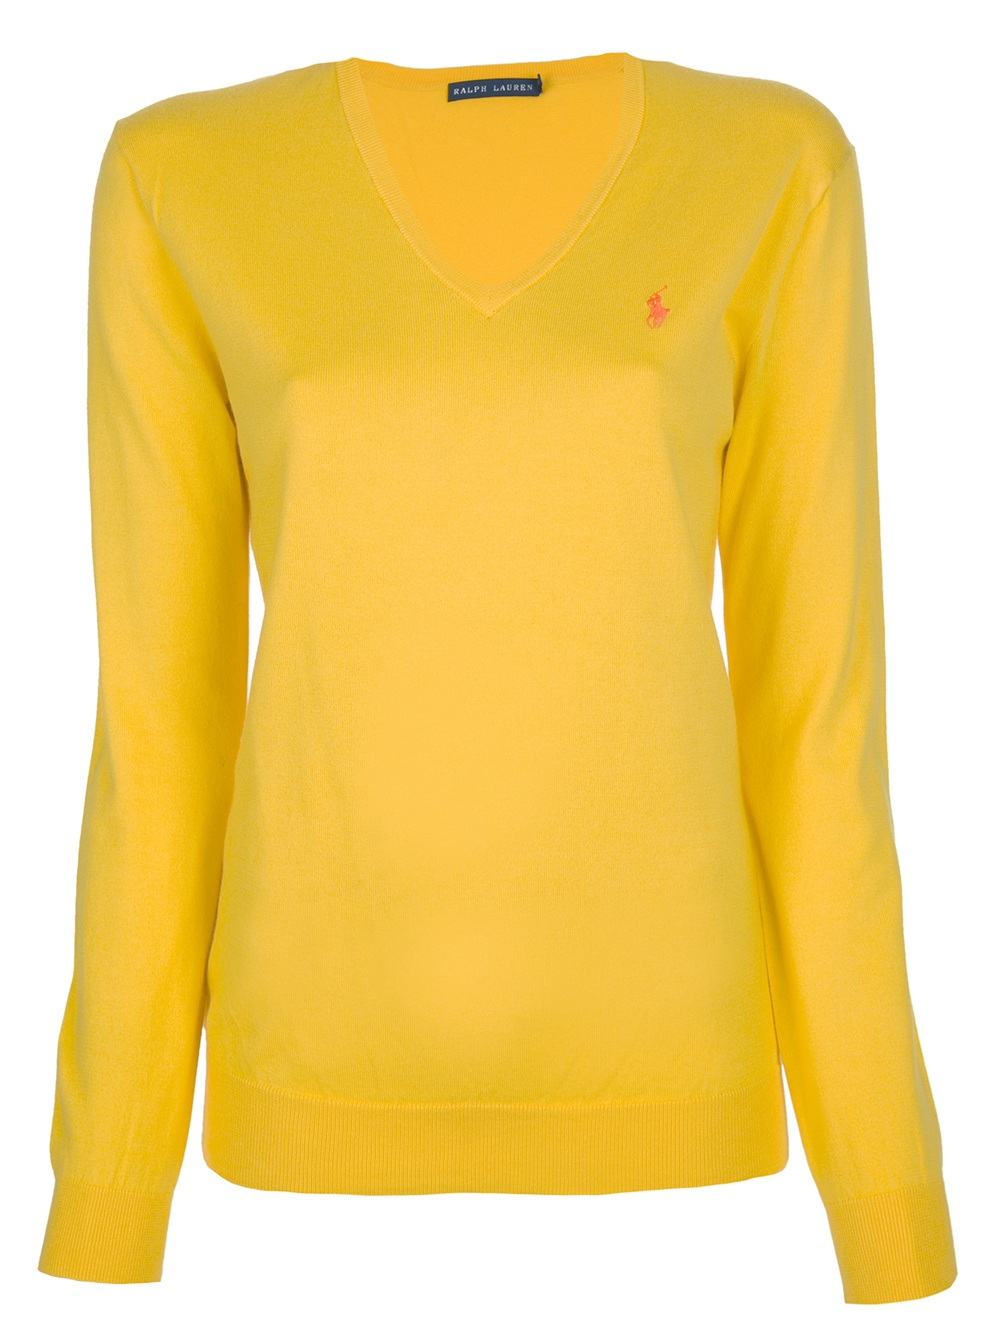 ralph lauren blue label fine gauge cotton v neck pullover in yellow lyst. Black Bedroom Furniture Sets. Home Design Ideas